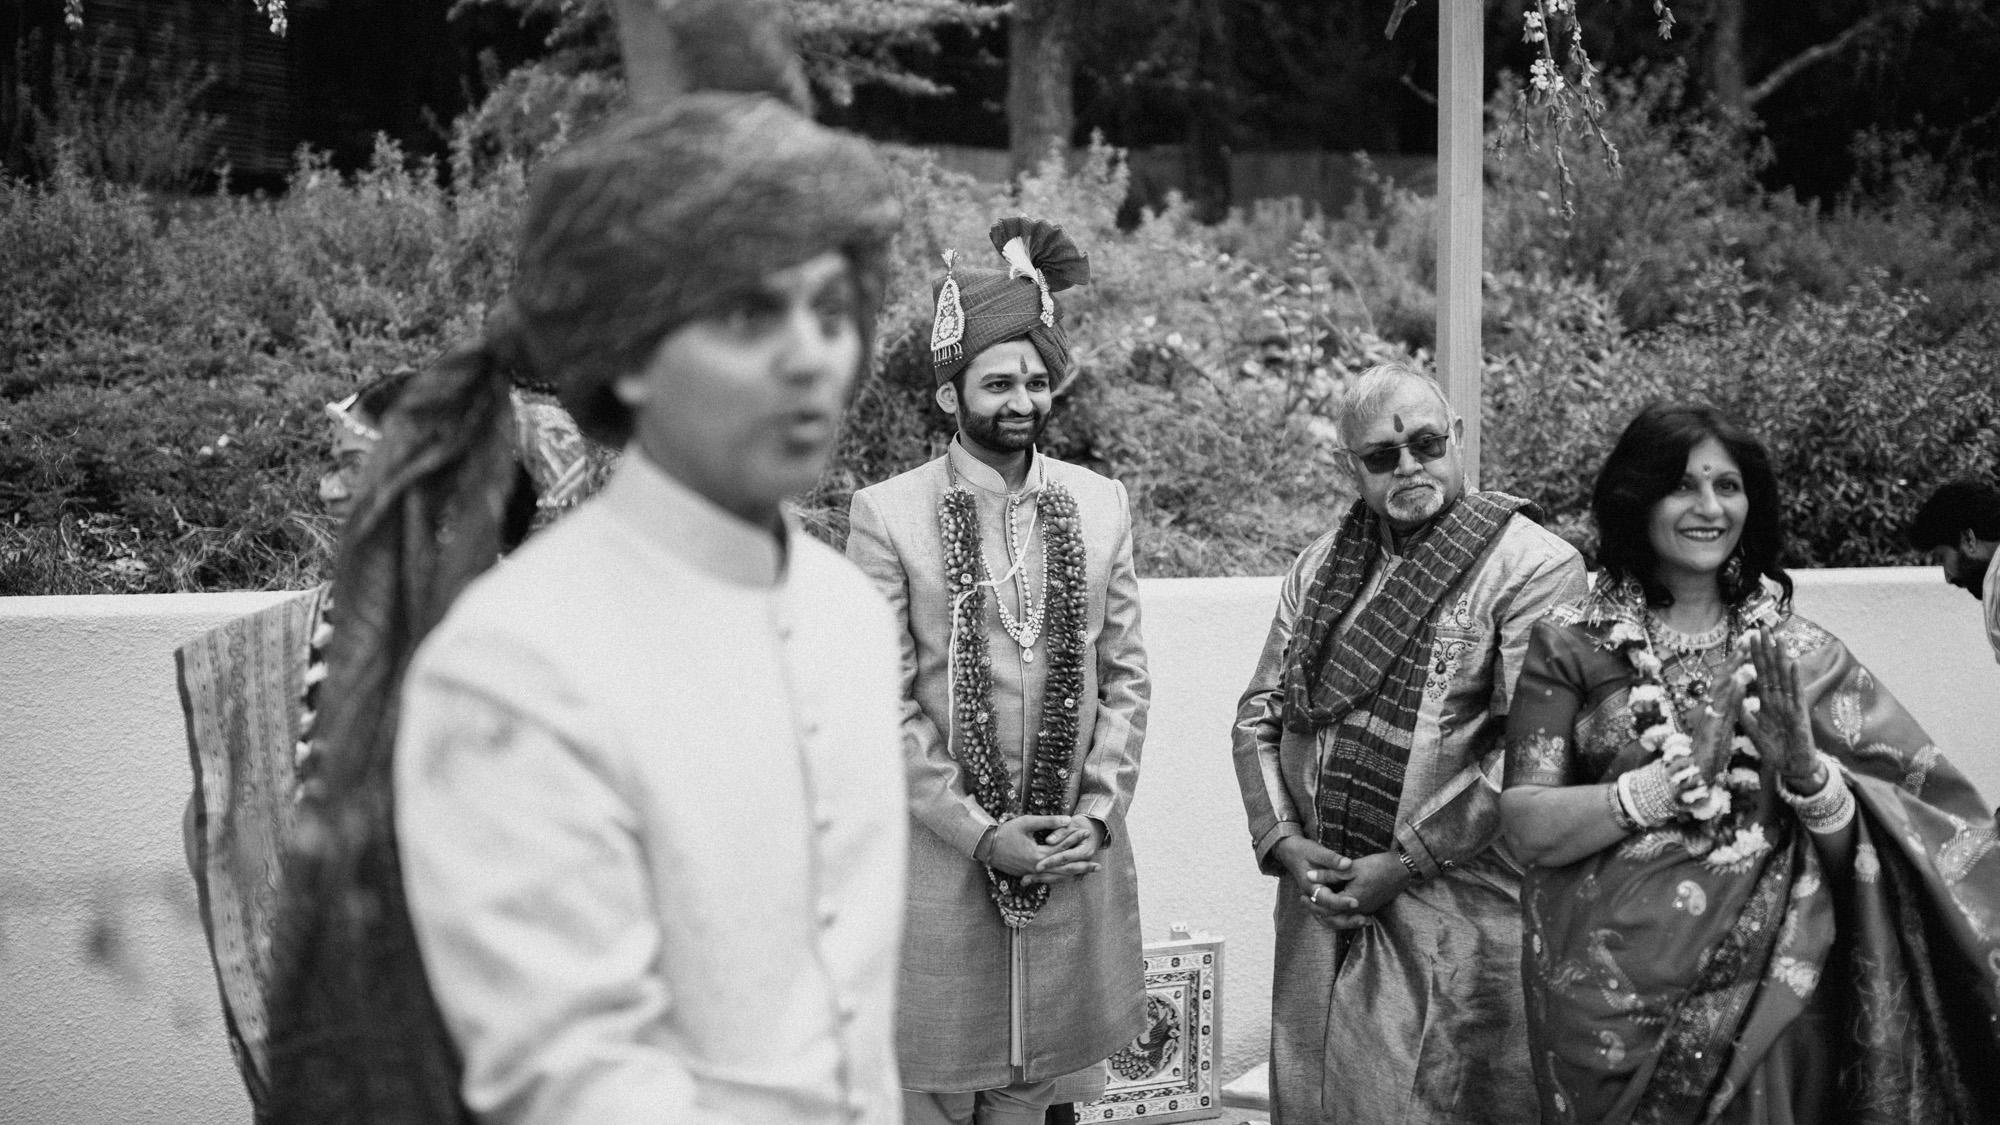 anu_maneesh_alec_vanderboom_Indian_wedding_photography-0097.jpg